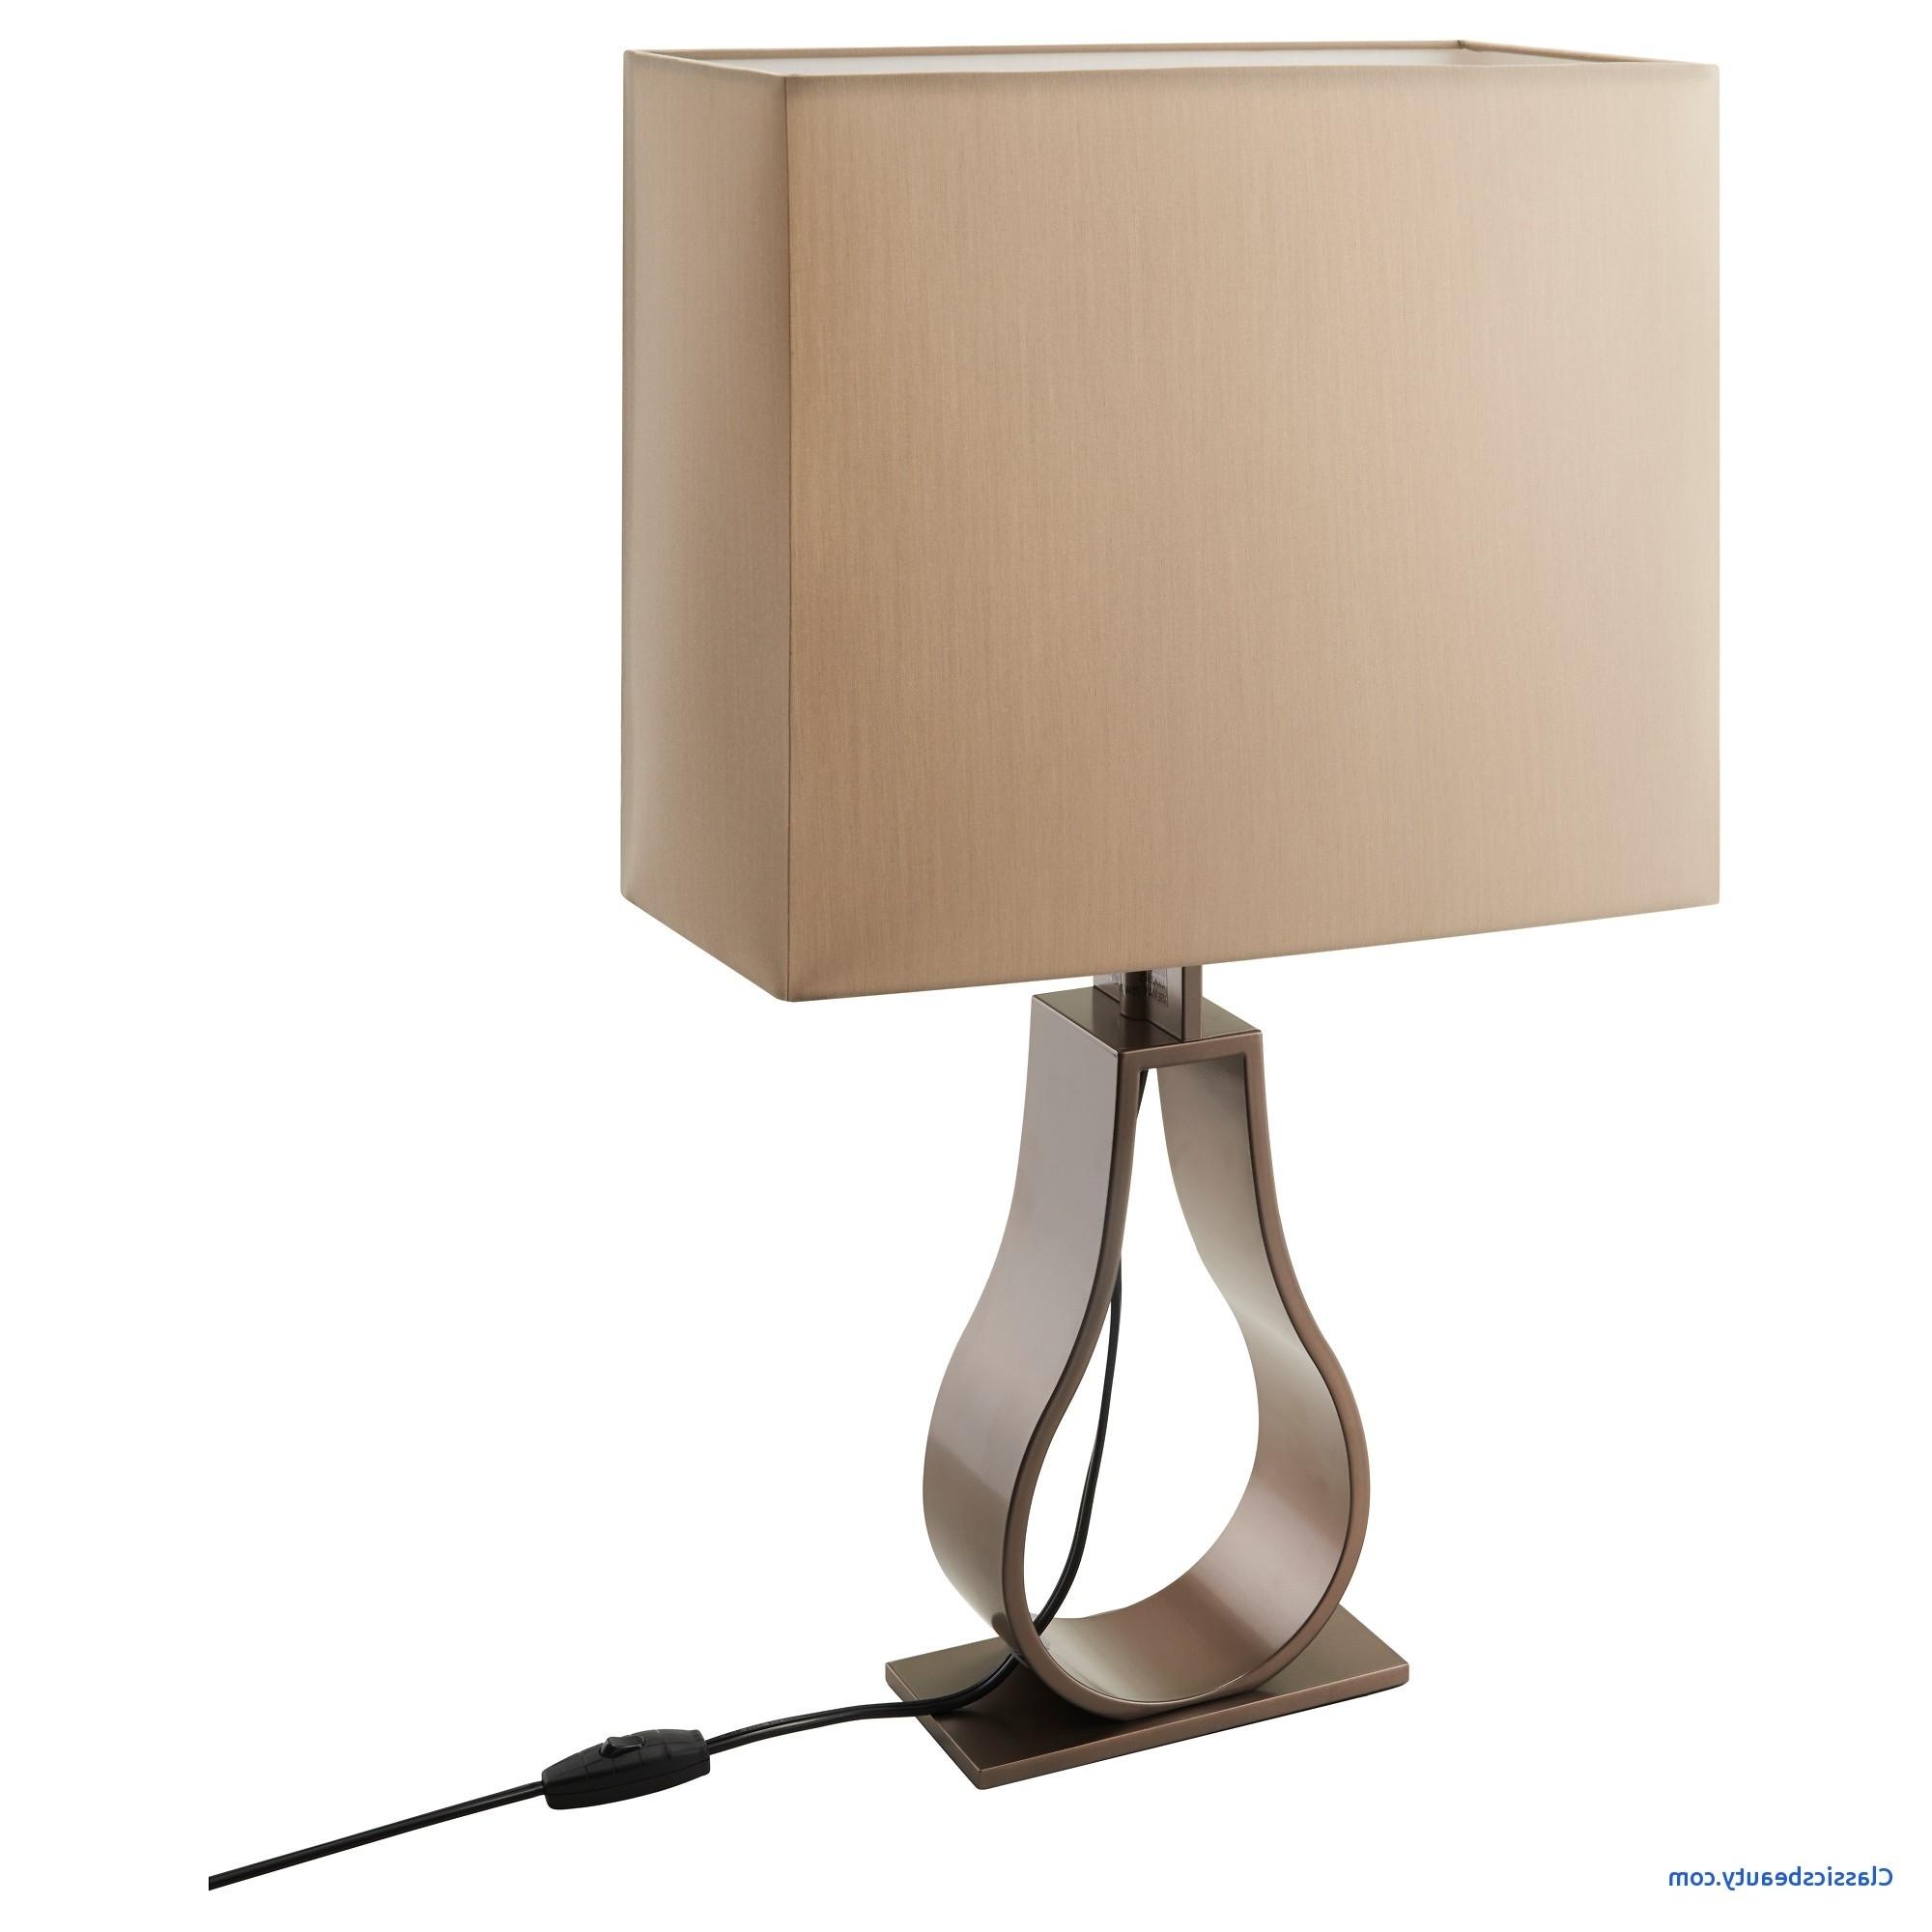 Newest Top 55 Splendid Walmart Floor Lamps Ceramic Table For Living Room Regarding Walmart Living Room Table Lamps (View 13 of 15)